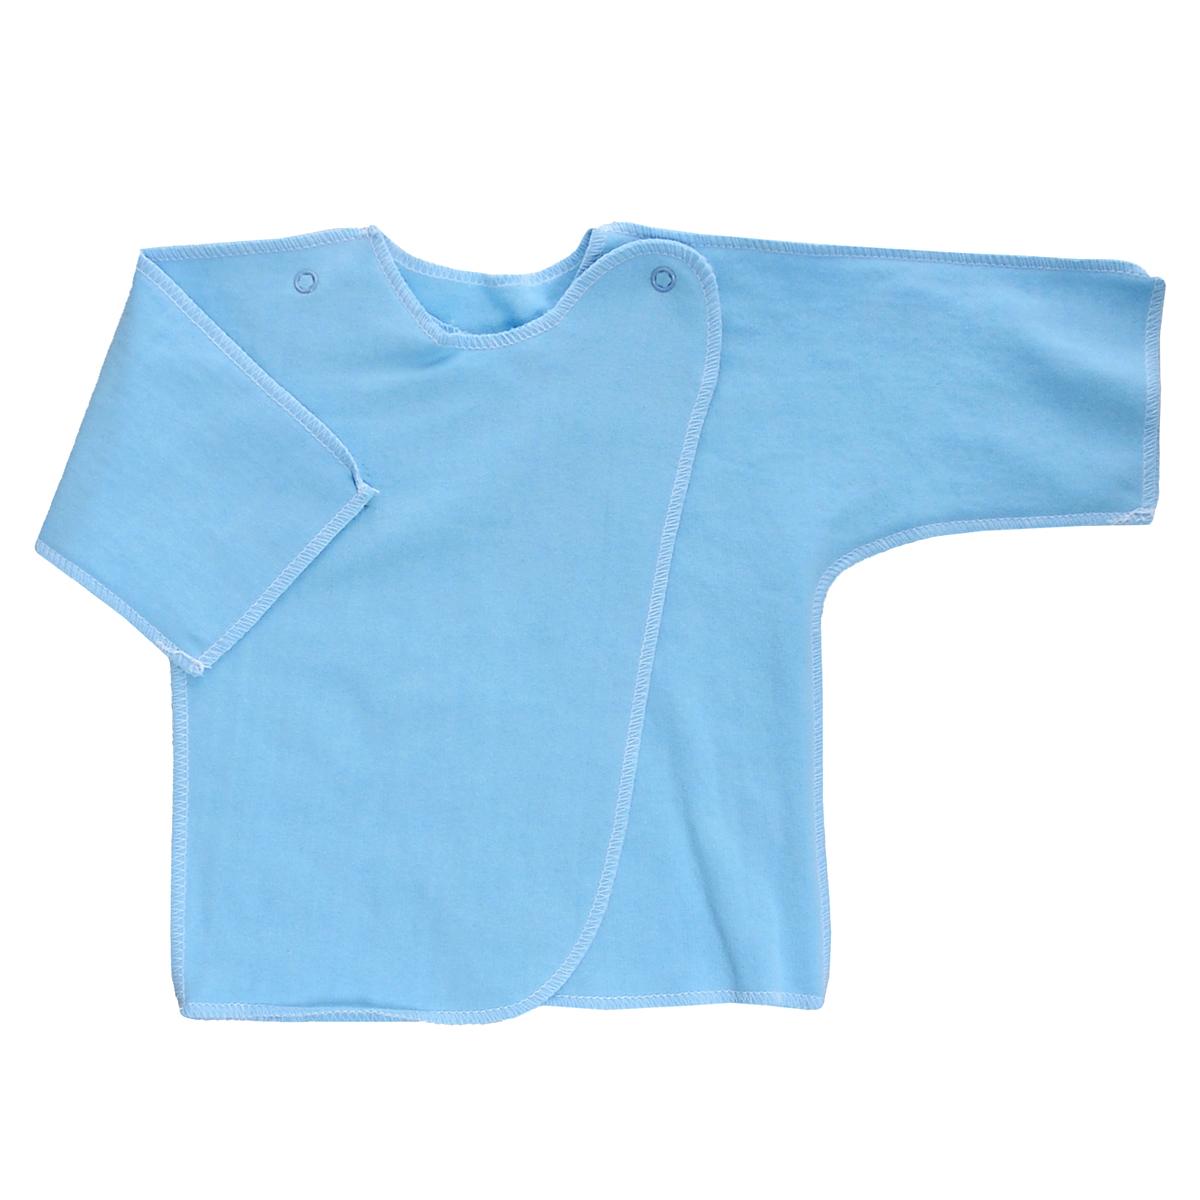 Распашонка Трон-Плюс, цвет: голубой. 5022. Размер 62, 3 месяца